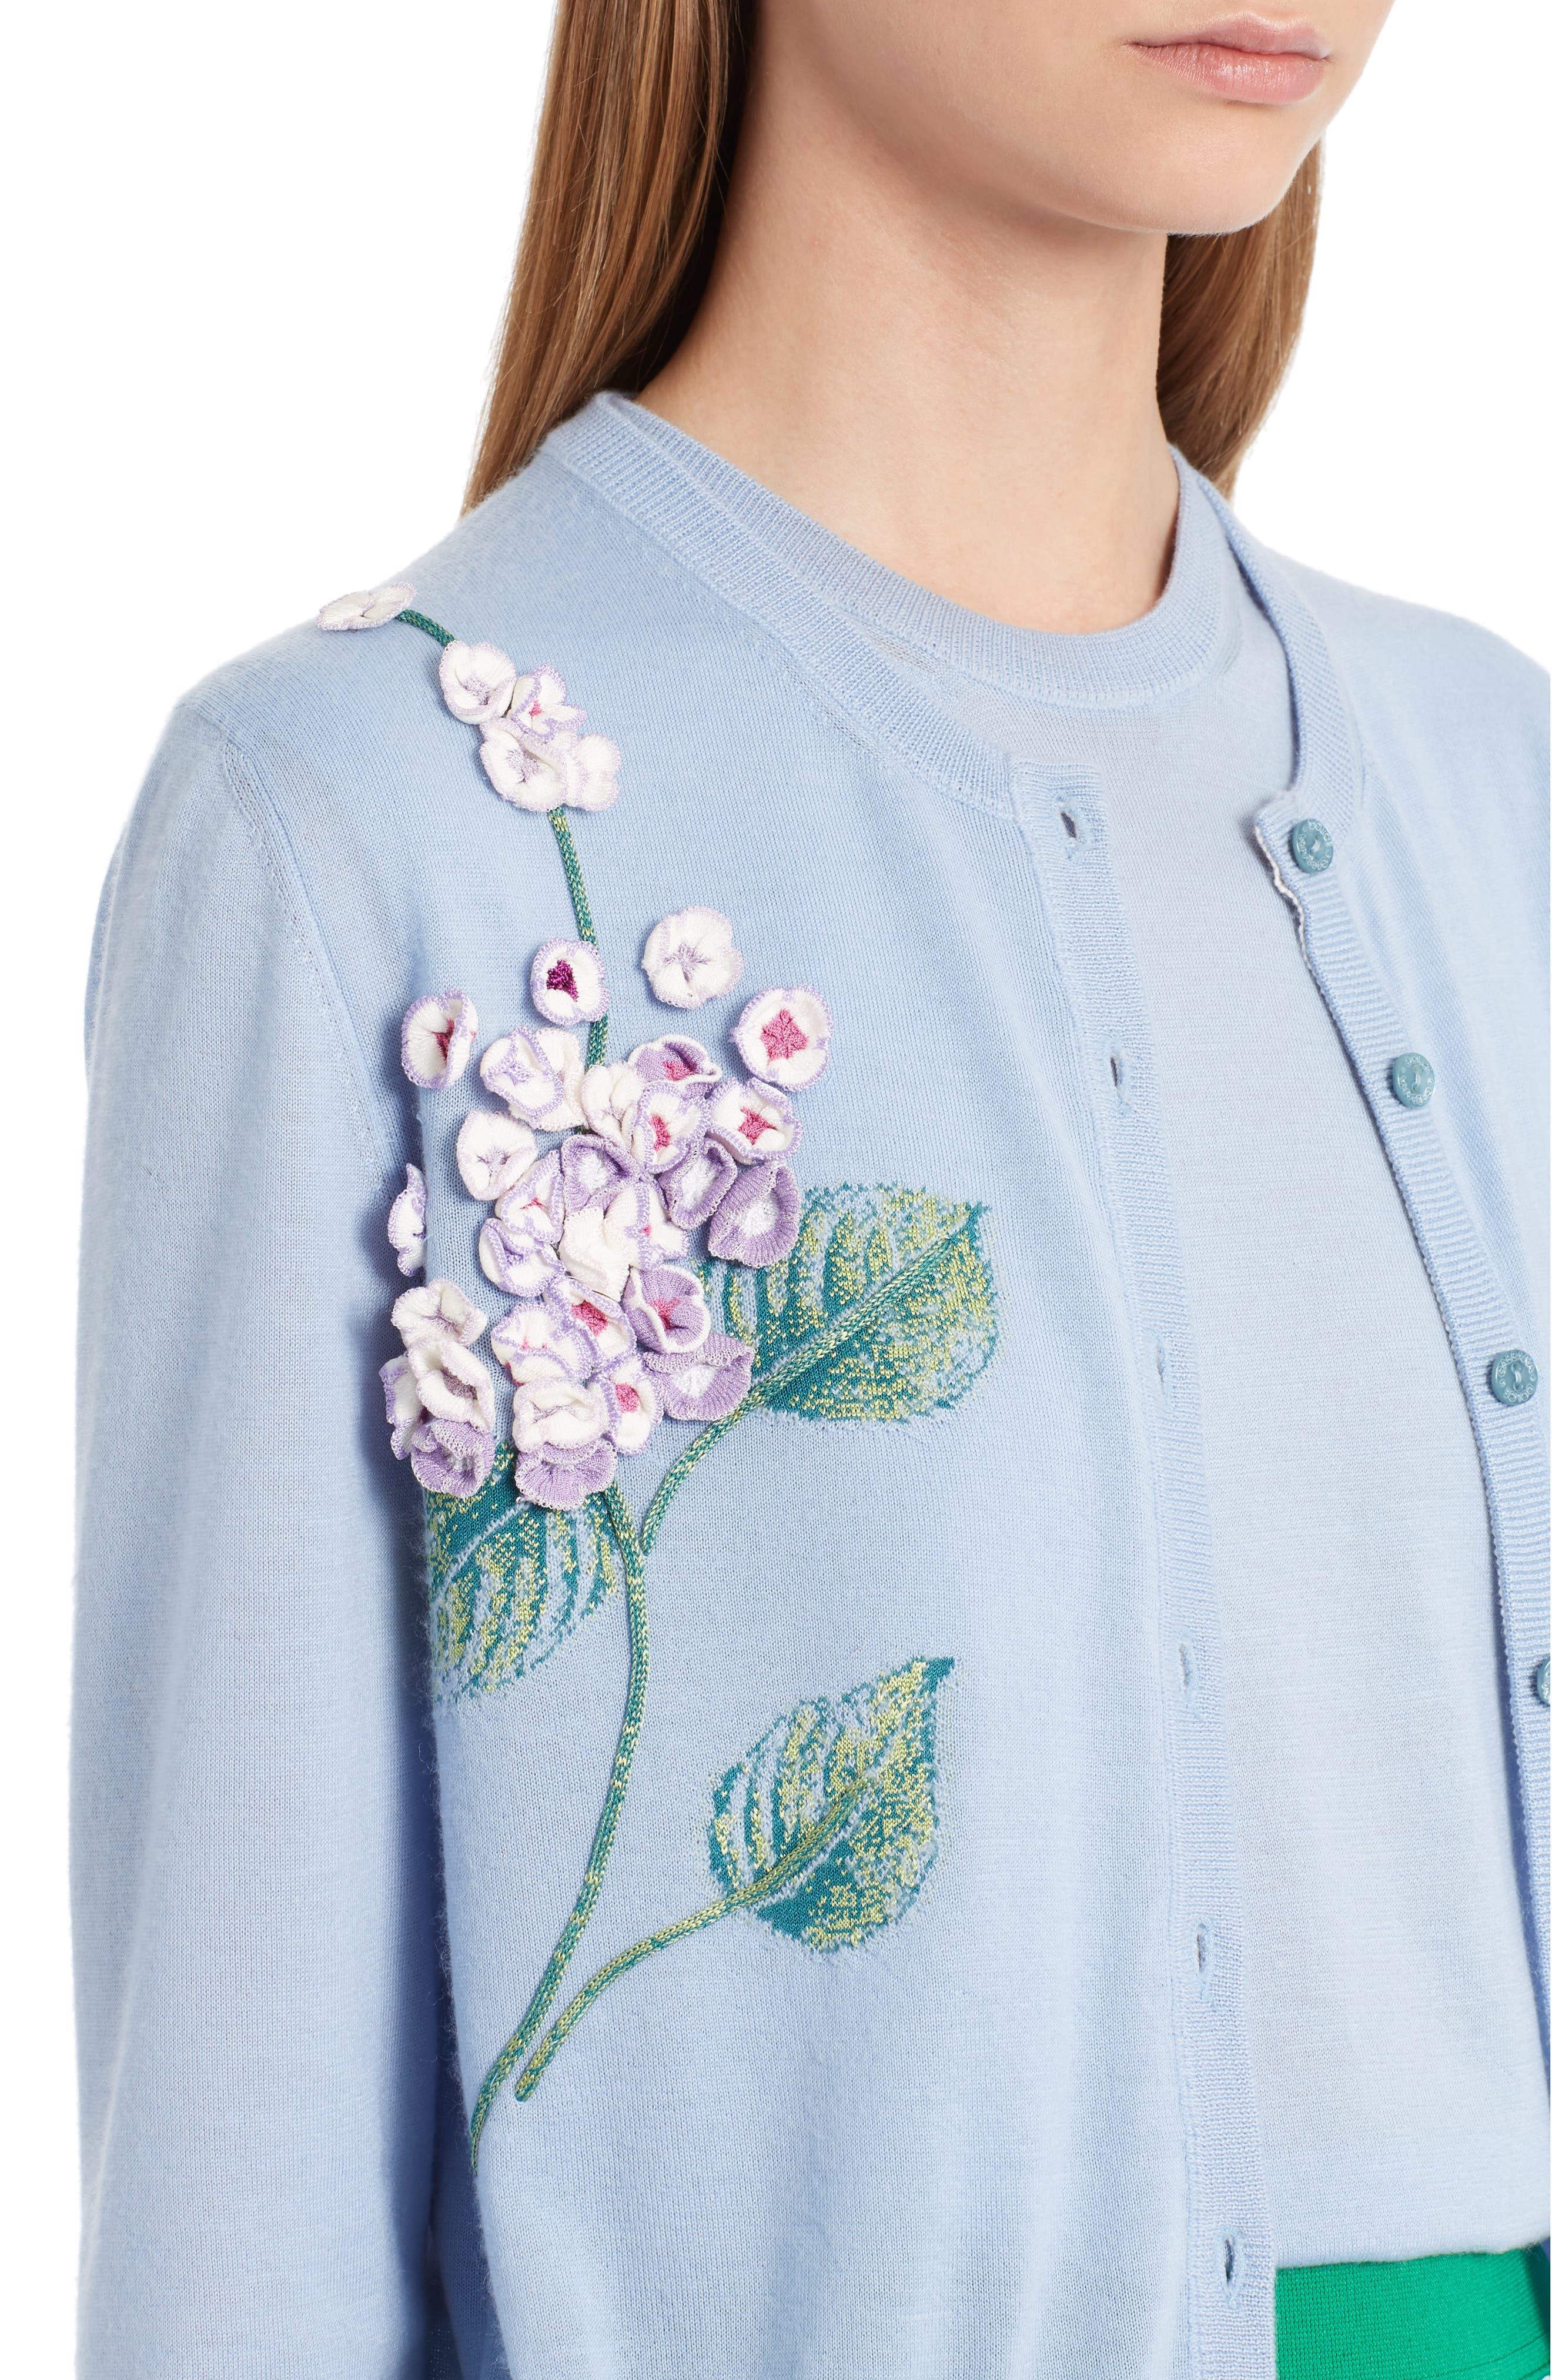 Embellished Cashmere & Silk Button Cardigan,                             Alternate thumbnail 4, color,                             450